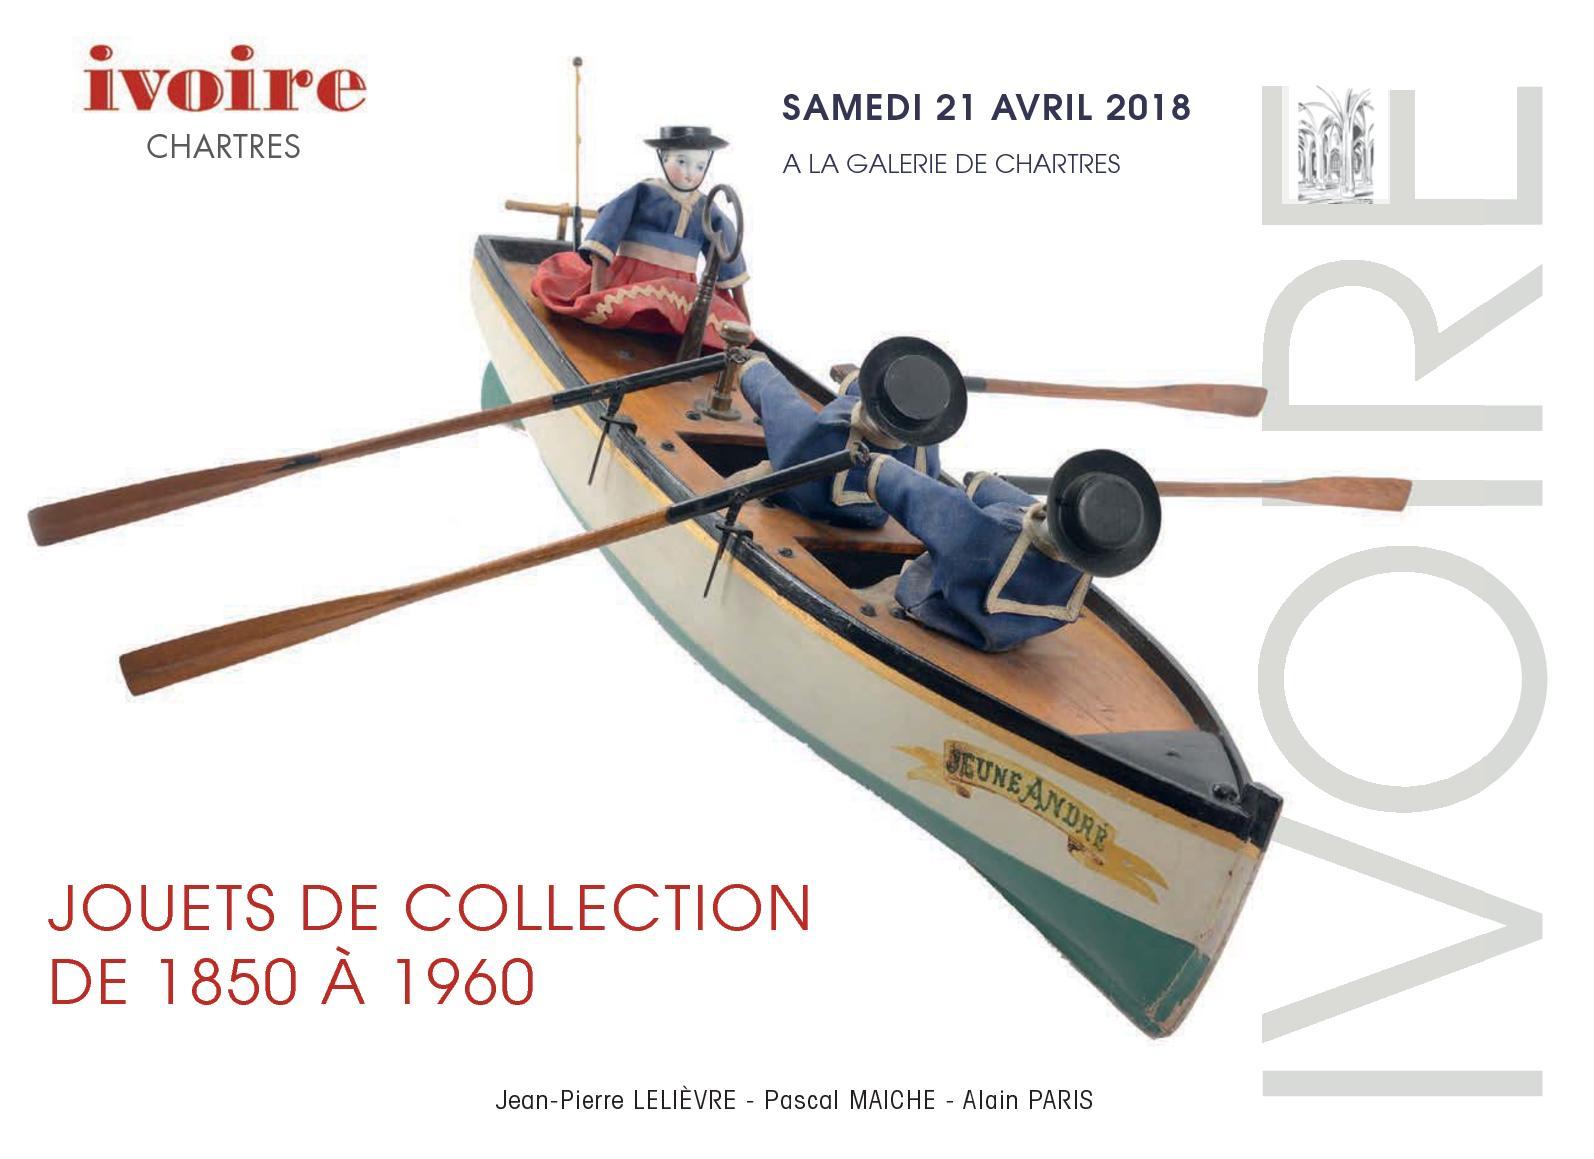 Chartres Jouets 21042018 Calaméo Collection De fvbY6g7y